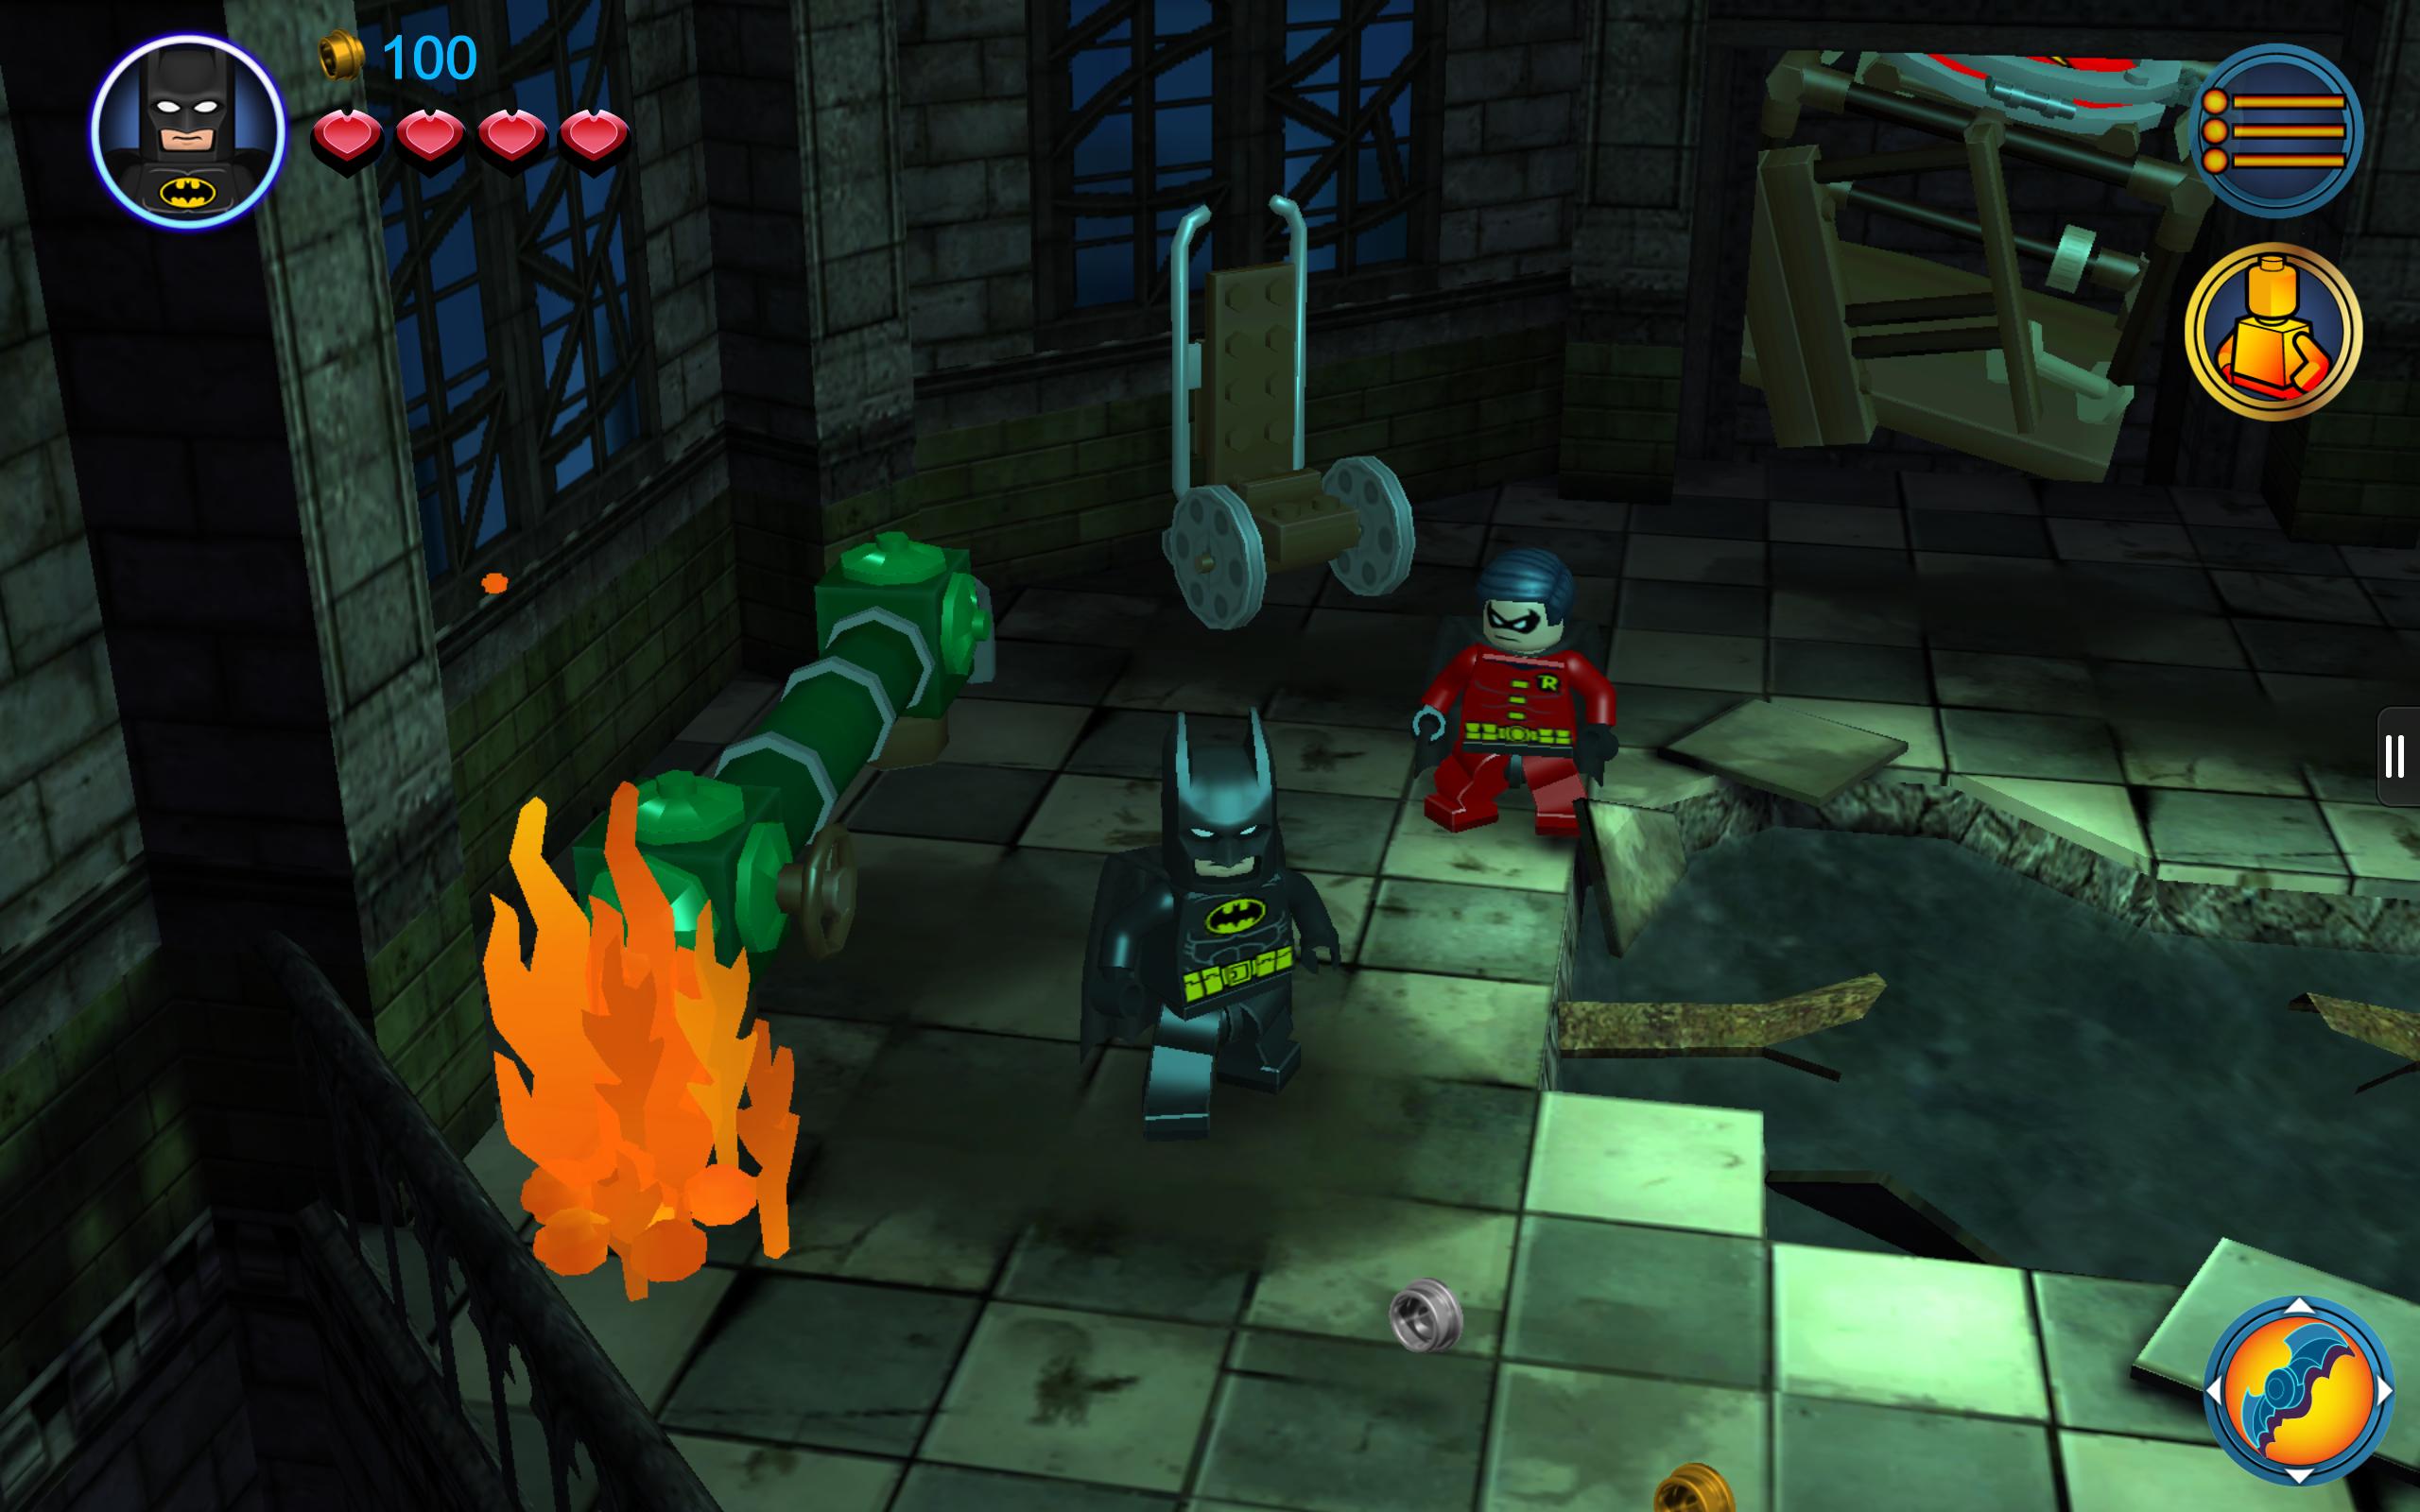 LEGO Batman: DC Super Heroes - Kindle FreeTime Unlimited ...